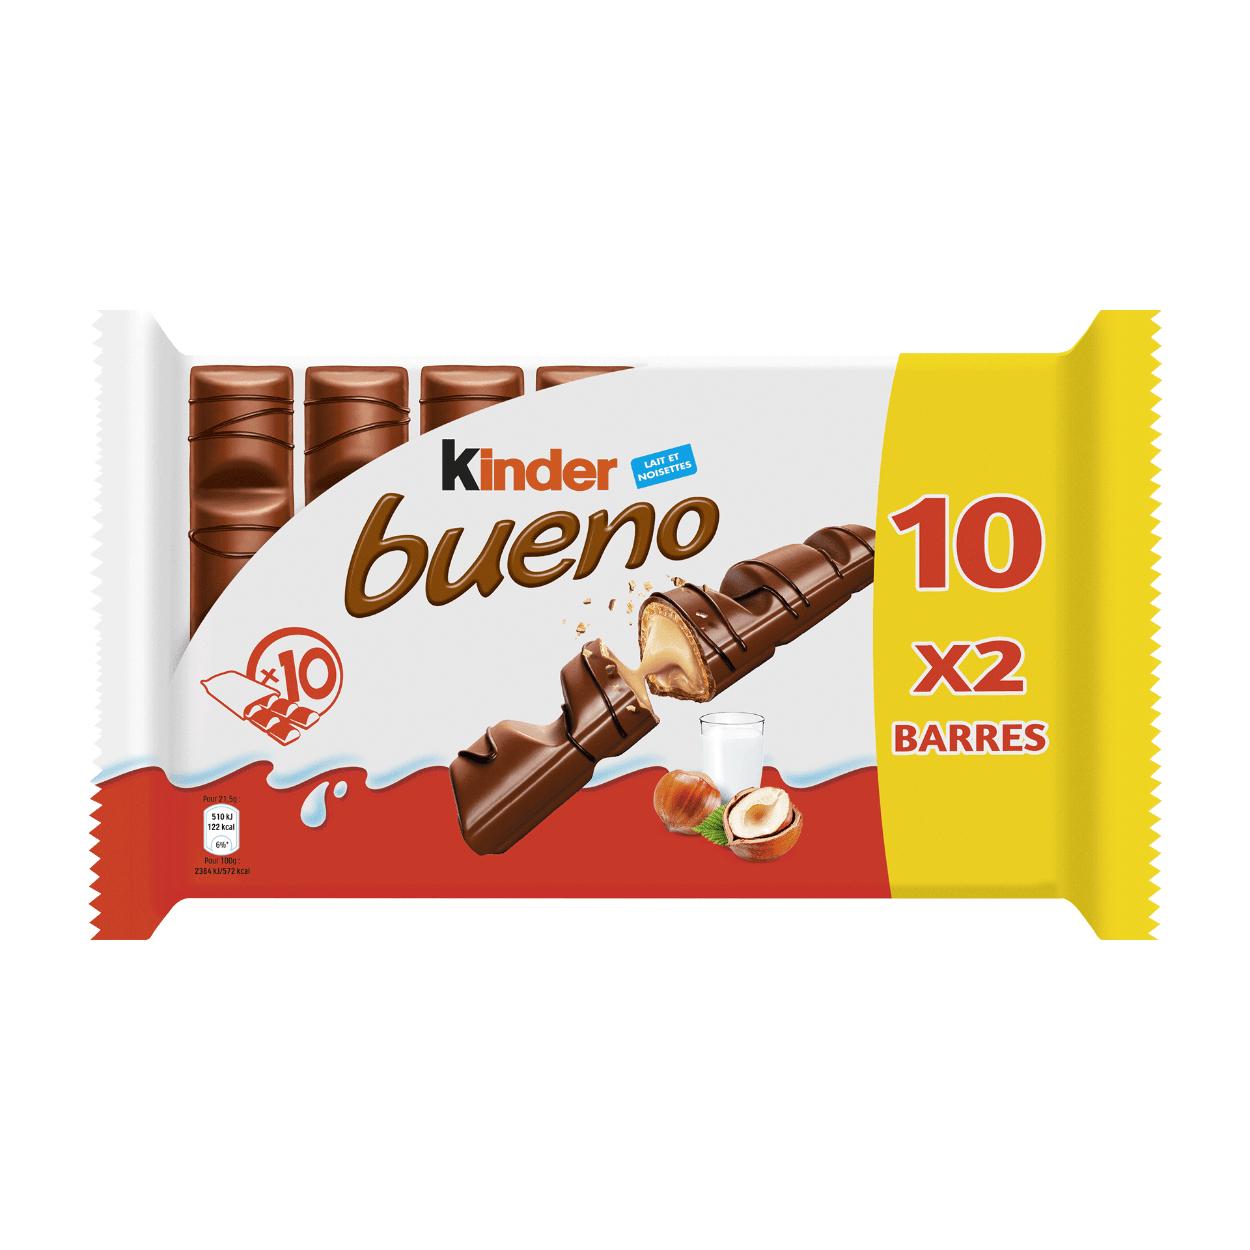 Paquet de 10 Kinder Bueno (10x2 barres)